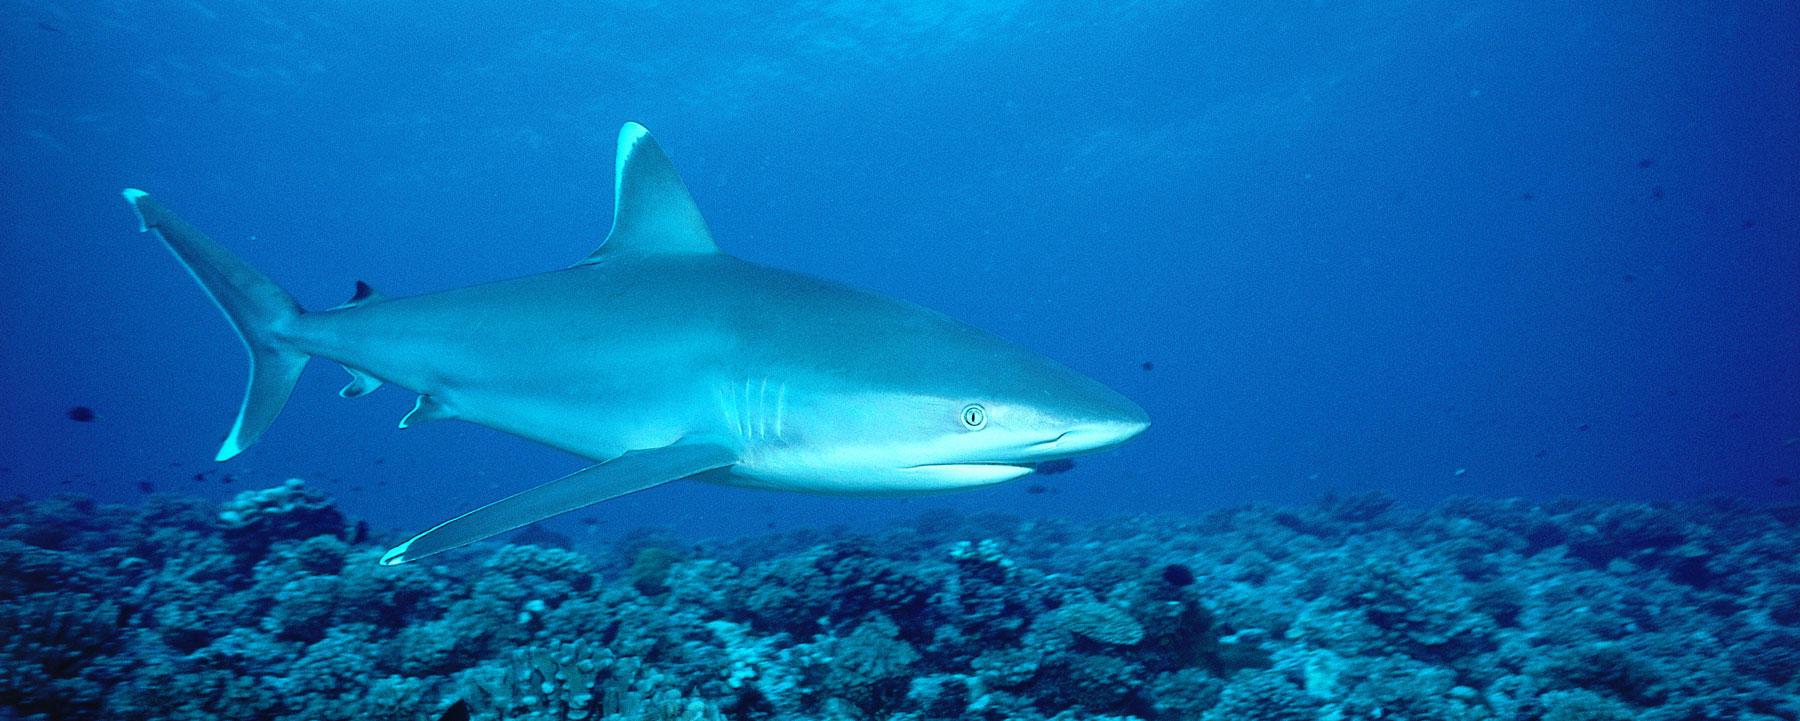 Silvertip shark swims in the ocean. Carcharhinus algimarginatus. Rangiroa, French Polynesia.